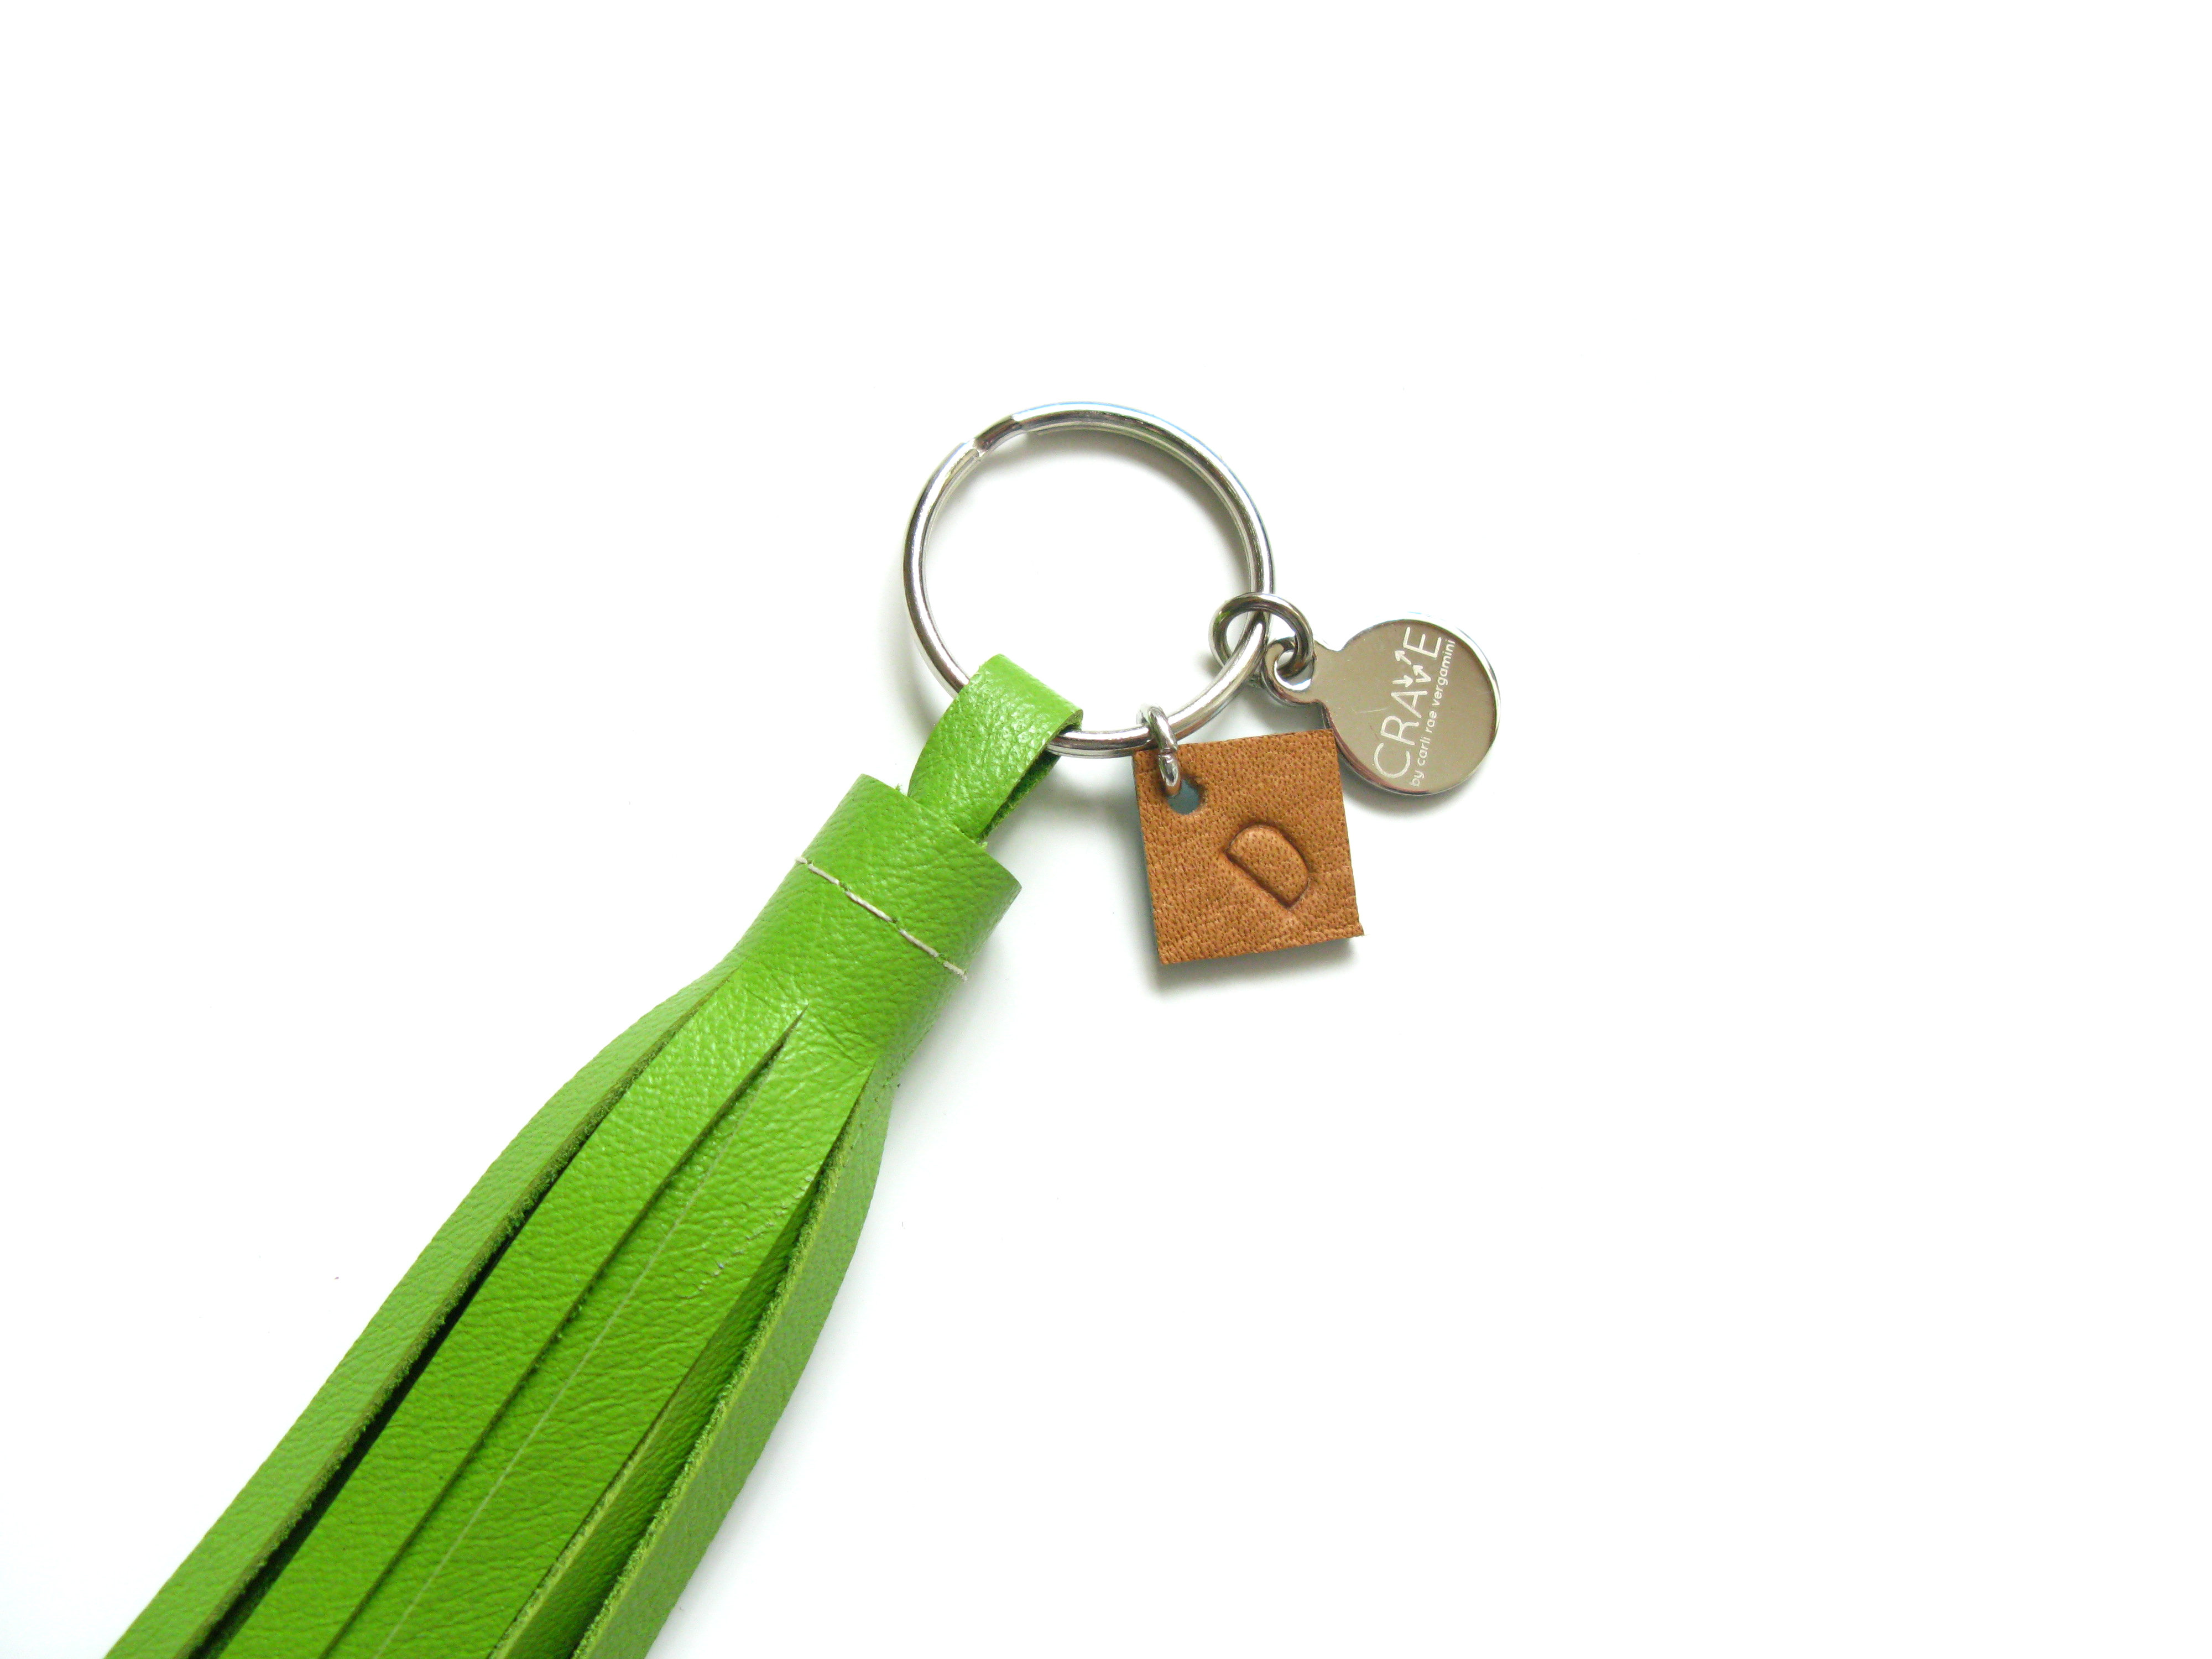 Leather Monogram Tassel Key Chain | Personalized Tassel | Initial Charm  Tassel | CRAVEbyCRV